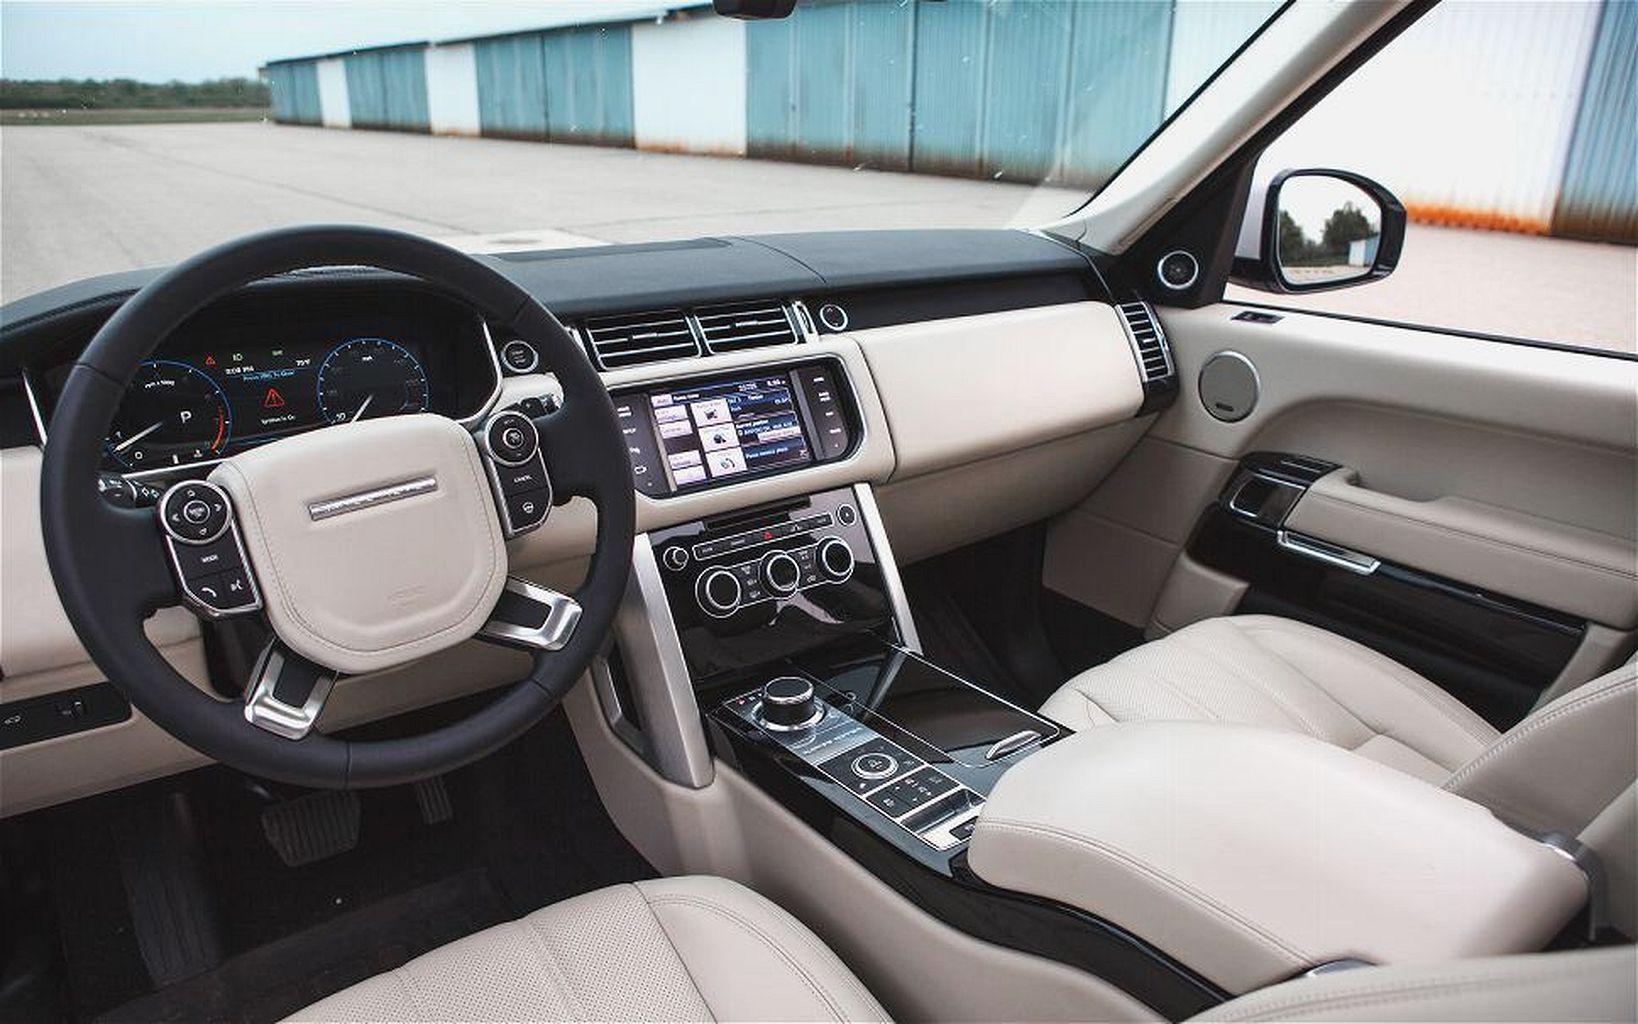 2017 Luxury Range Rover Sport Interior Range rover hse